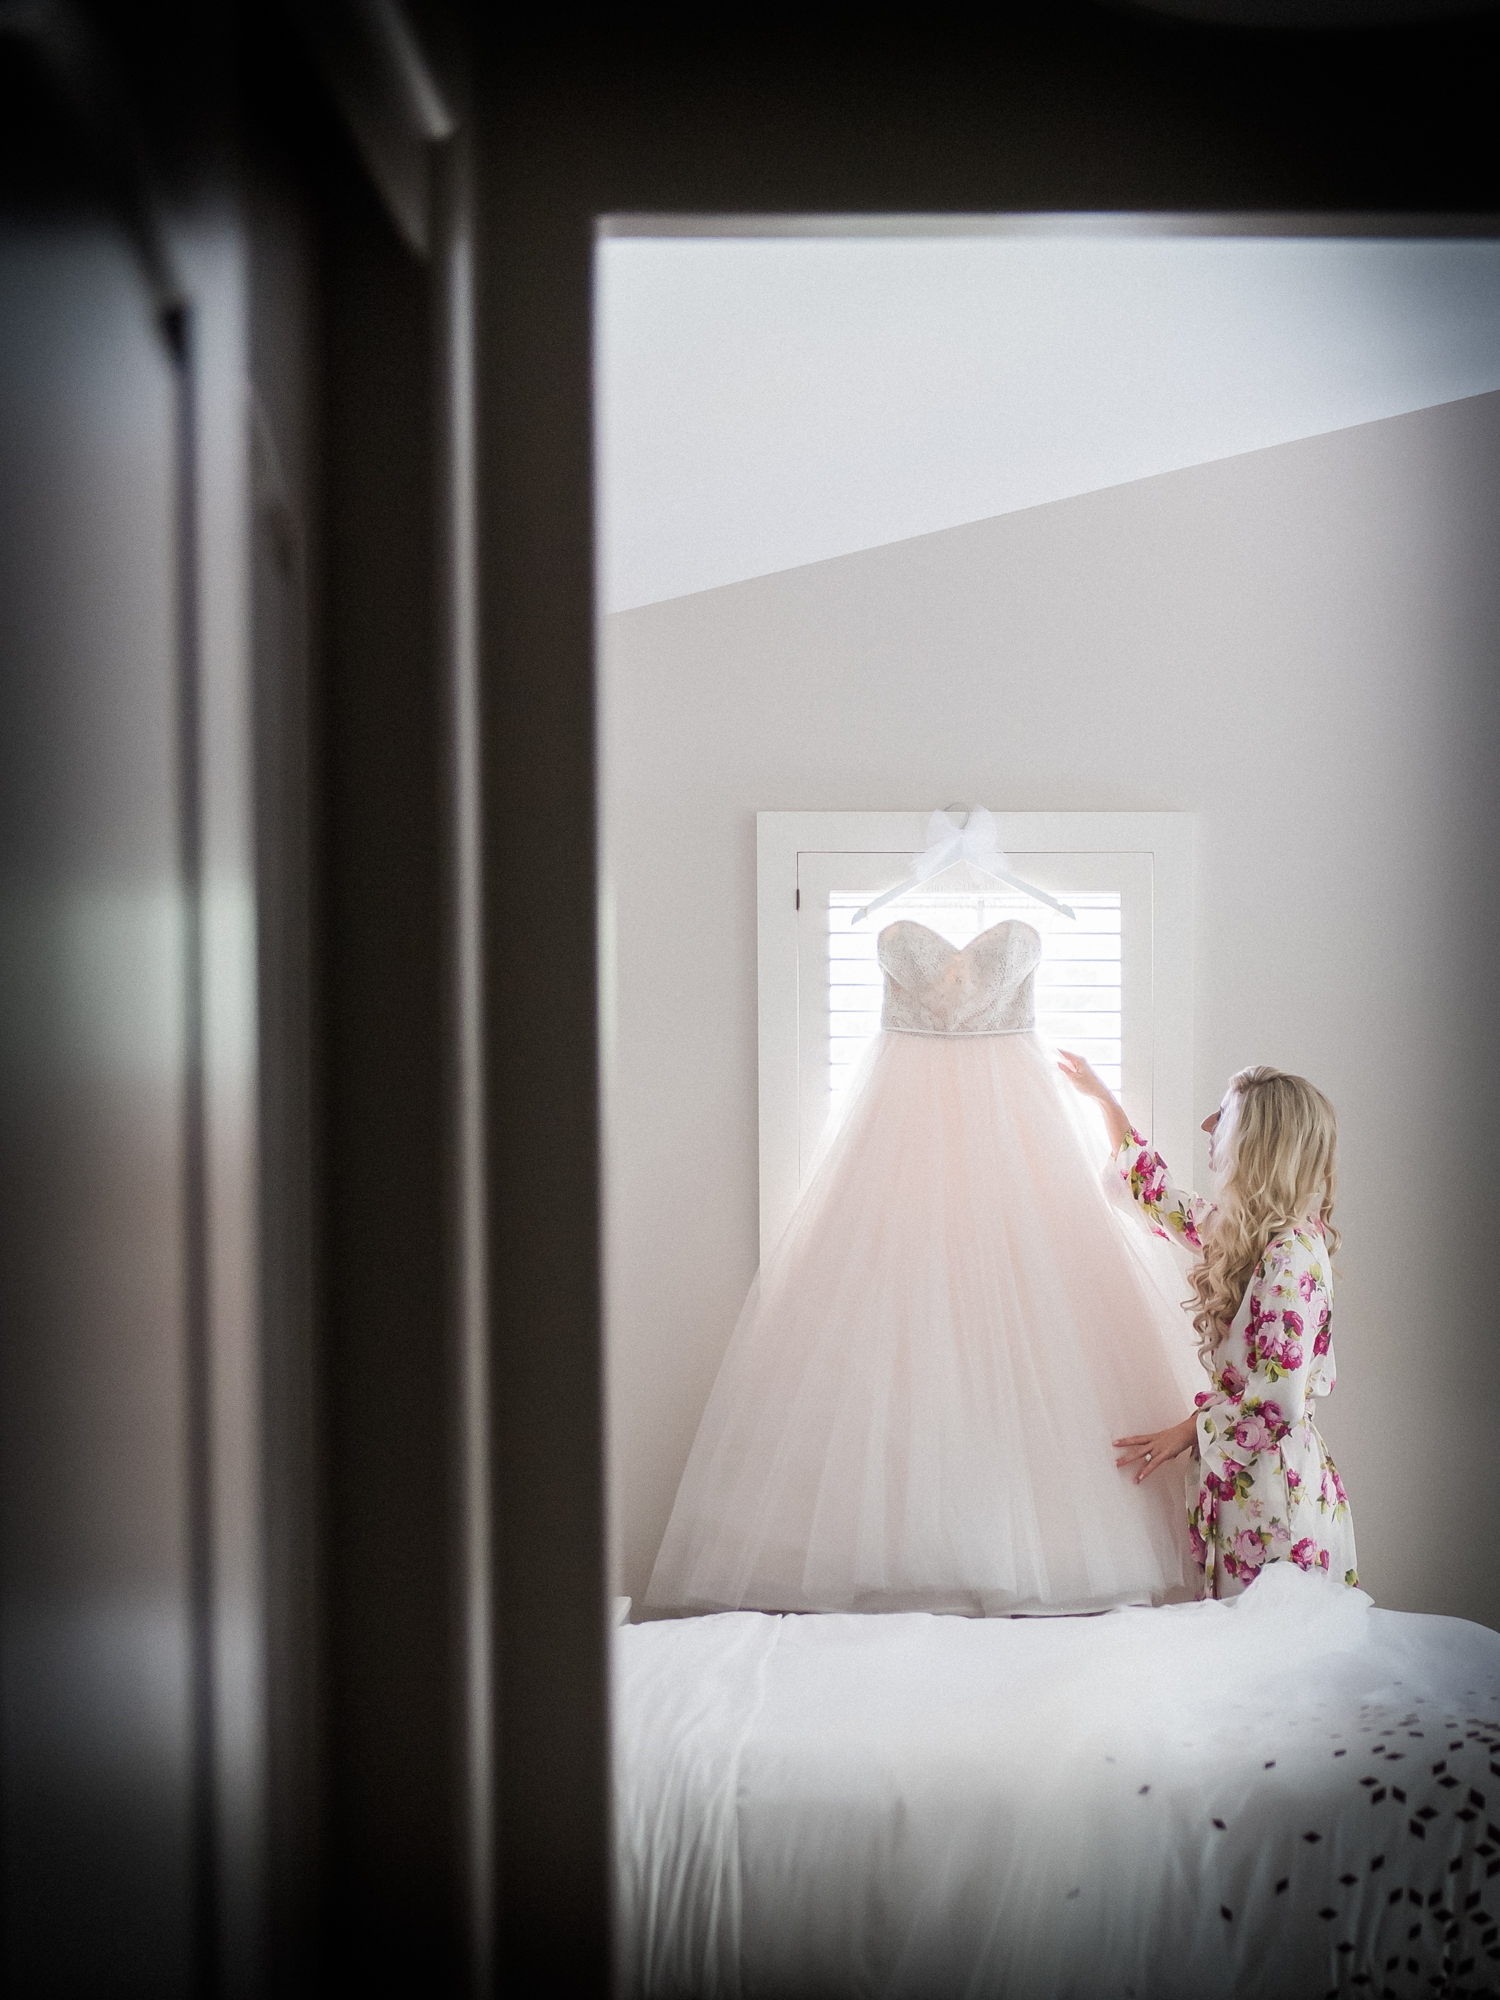 Aimee+Logan_wedding_spp-3.jpg